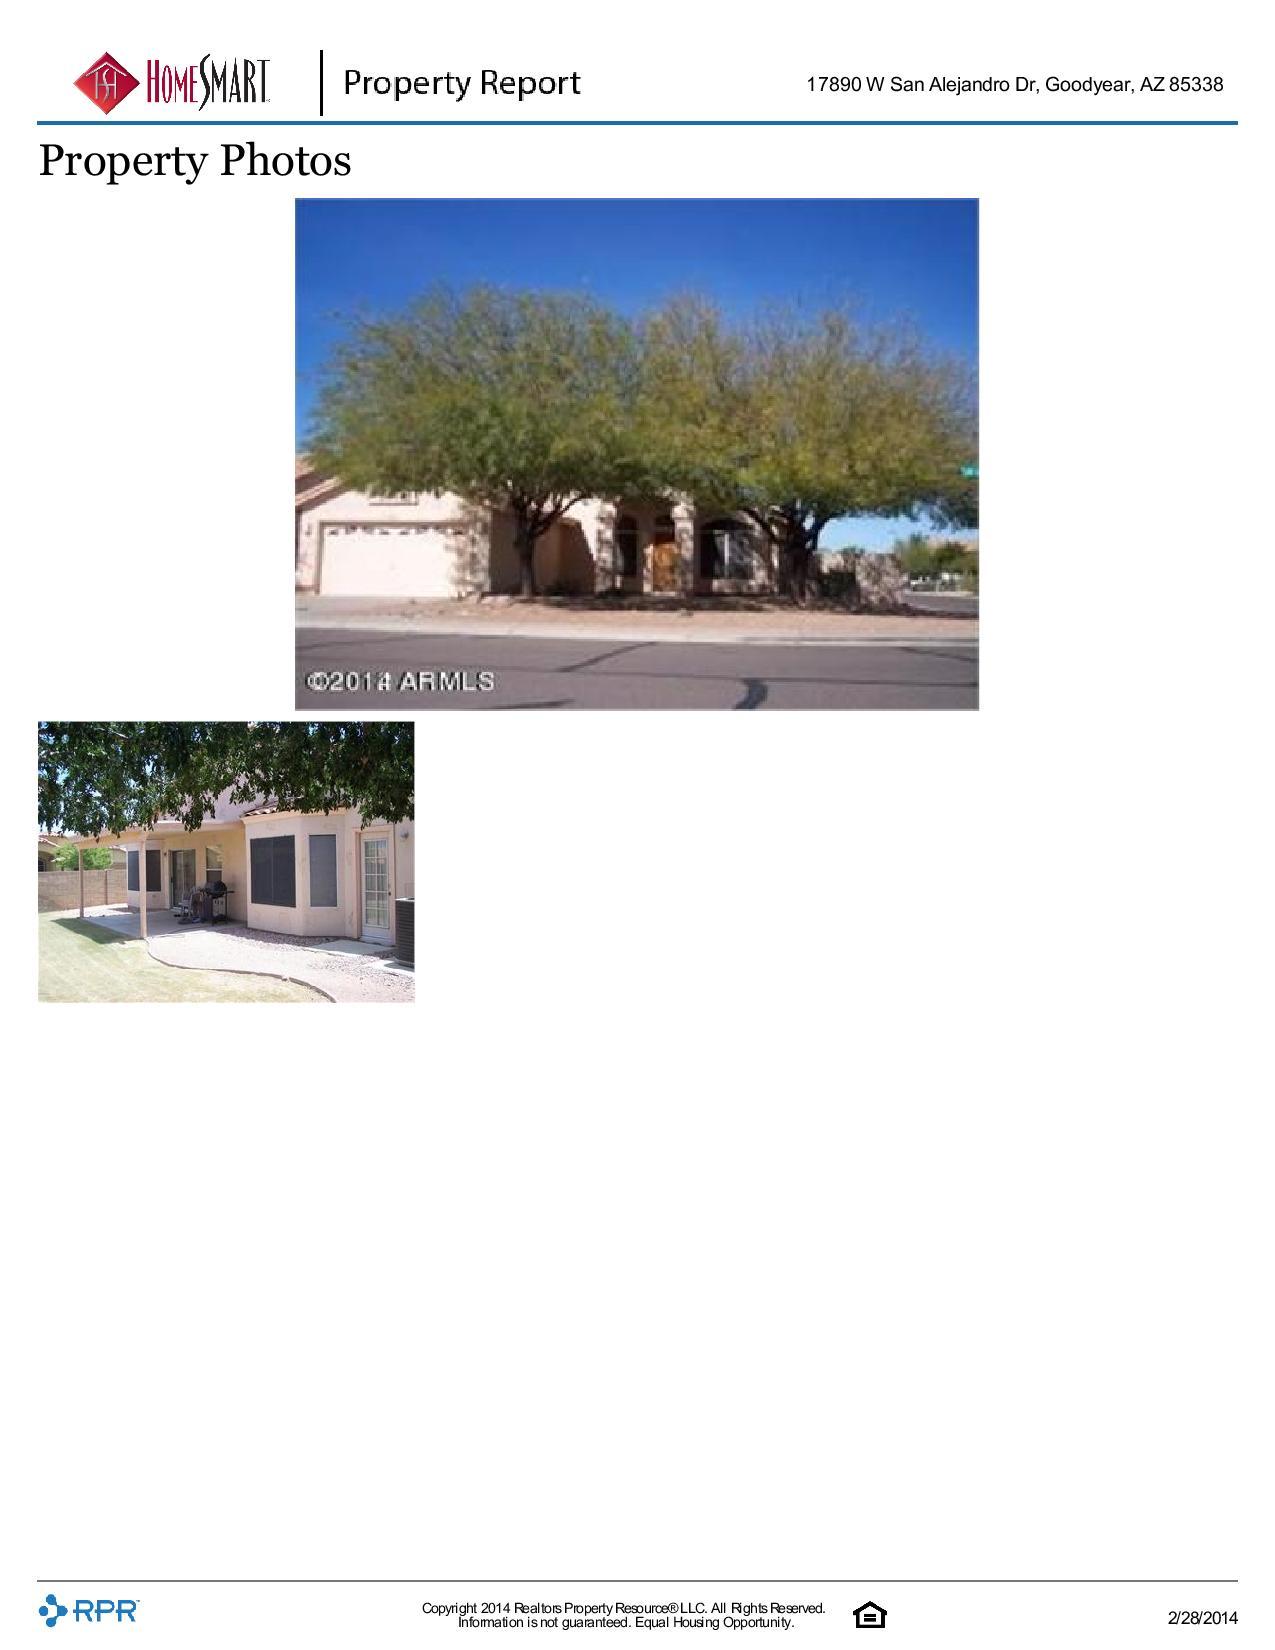 17890-W-San-Alejandro-Dr-Goodyear-AZ-85338-page-005